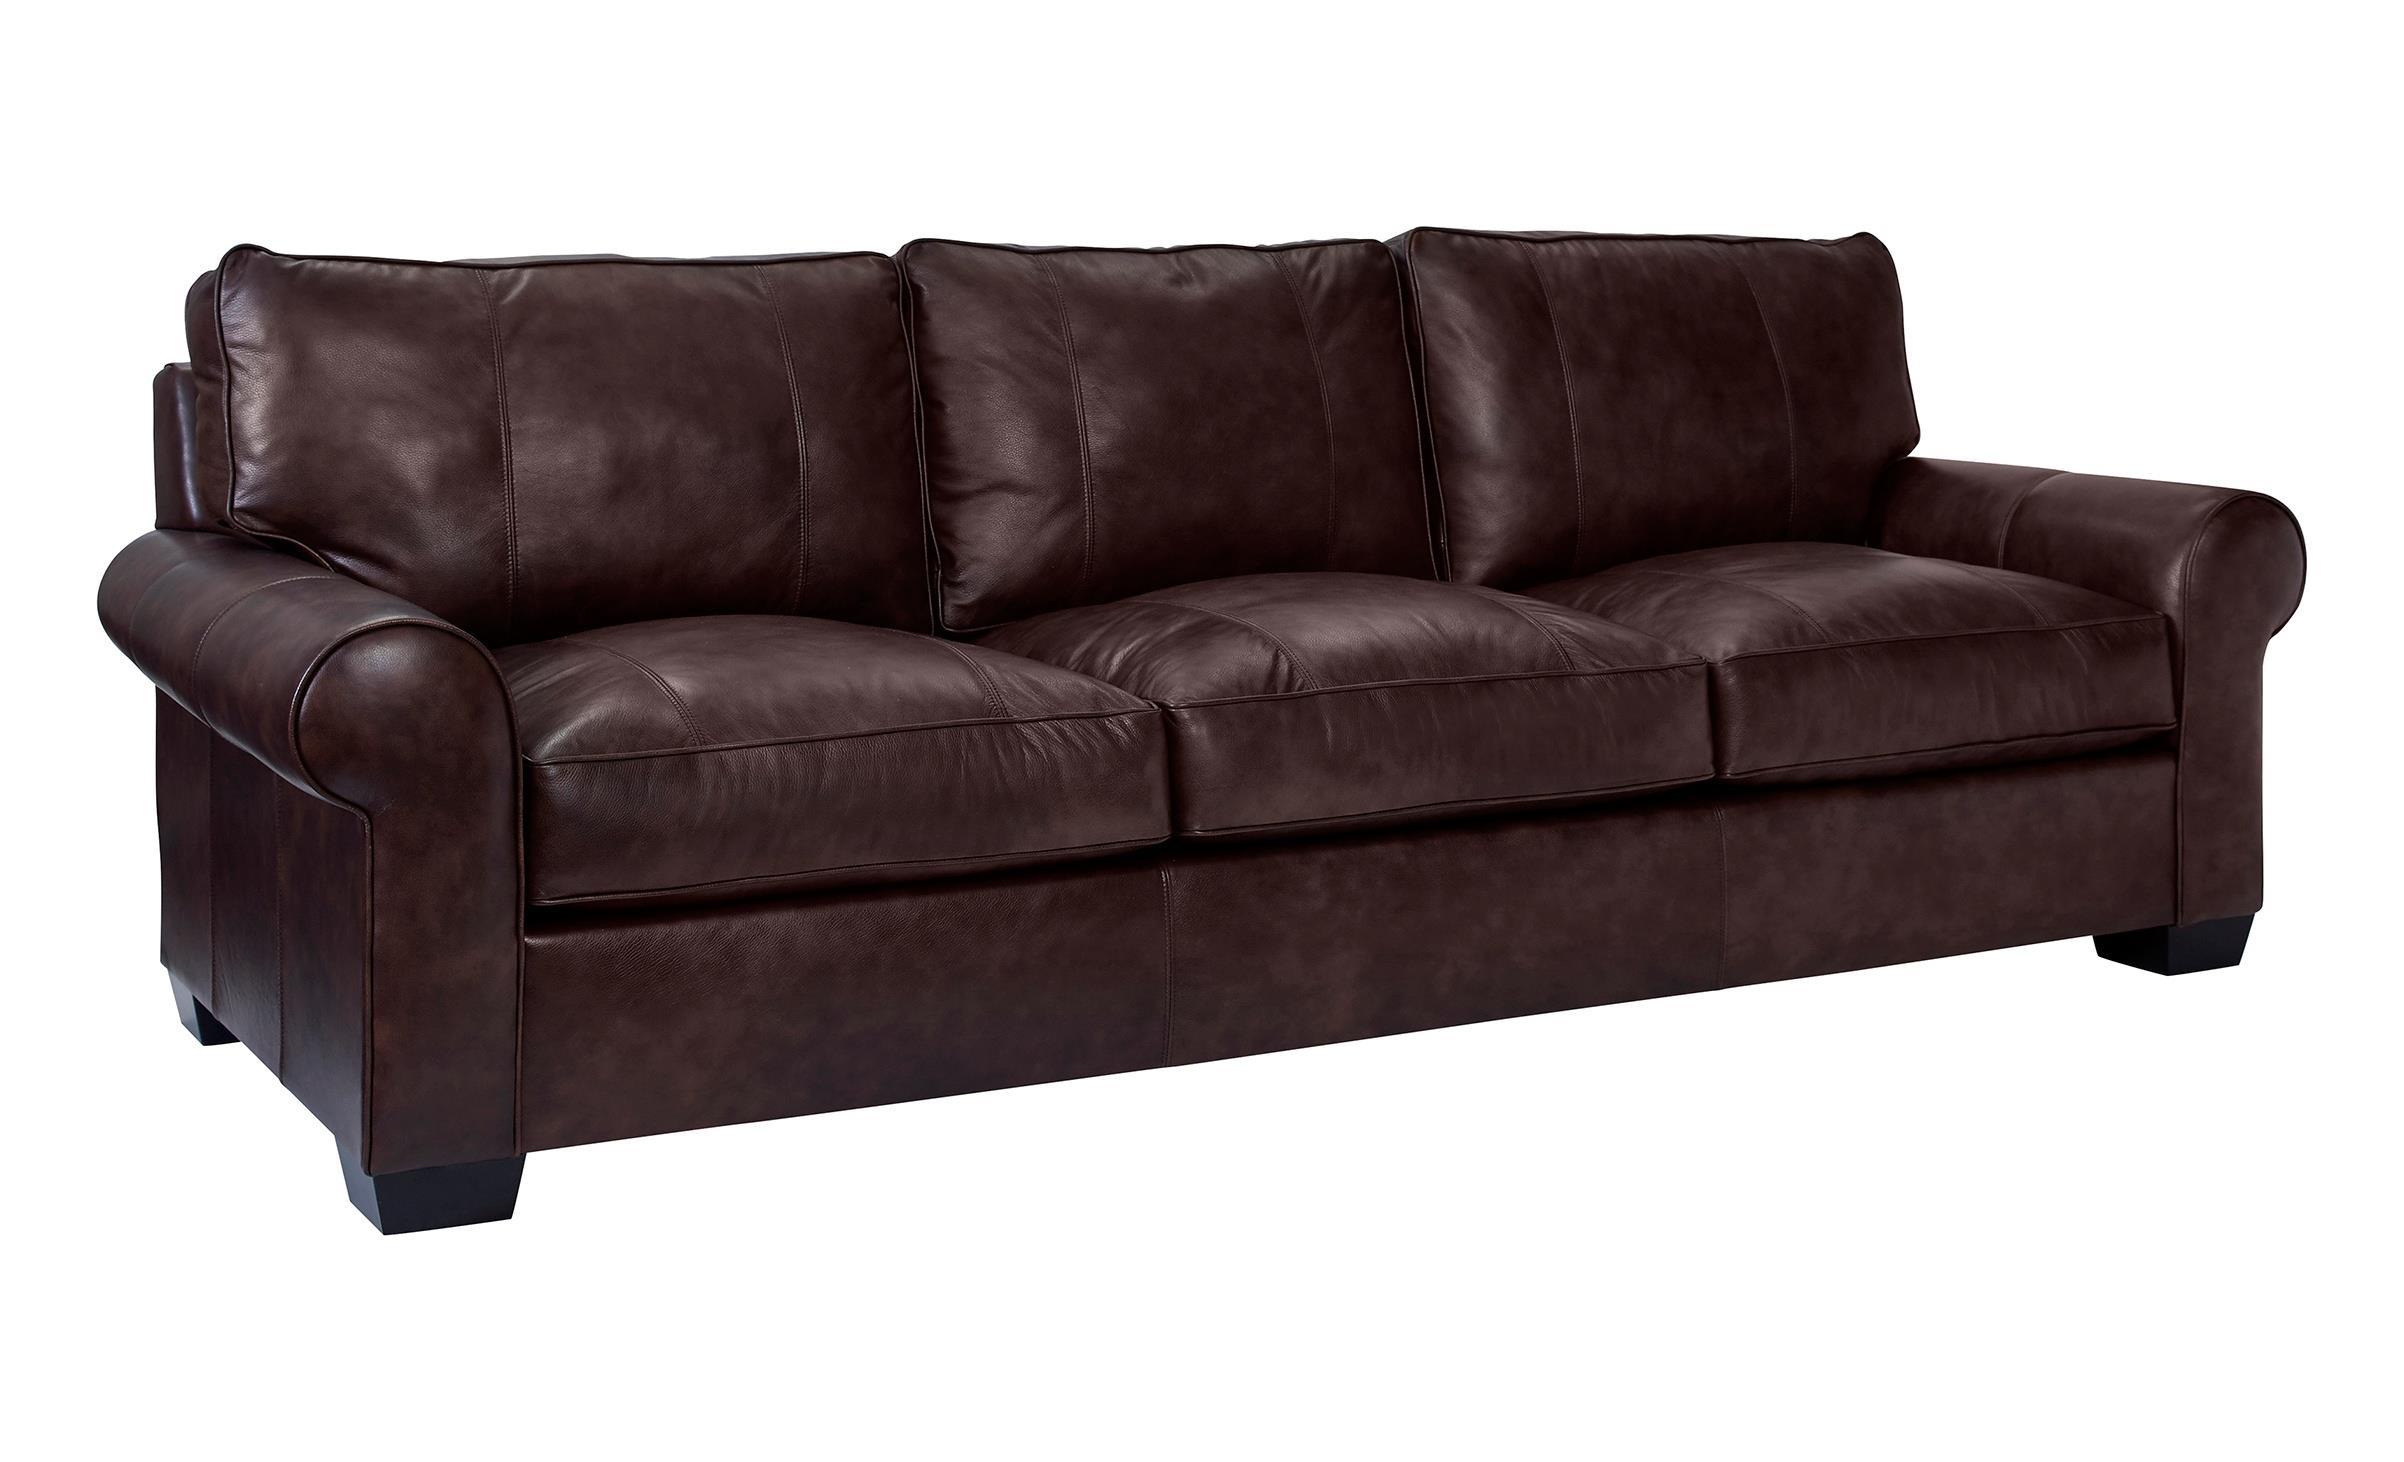 Broyhill Furniture Isadore Sofa - Item Number: L4272-3-0063-89